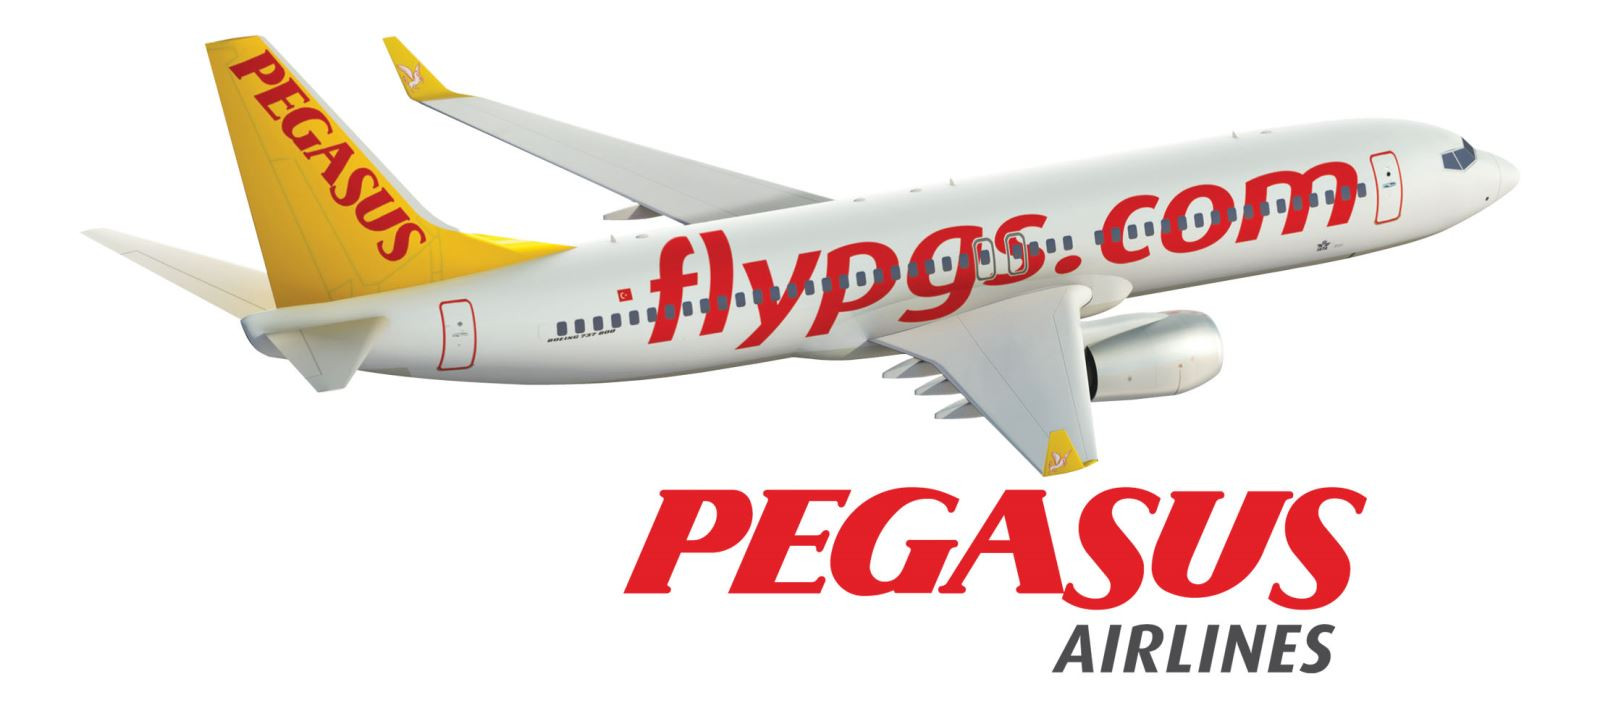 pegasus-airlines.jpg